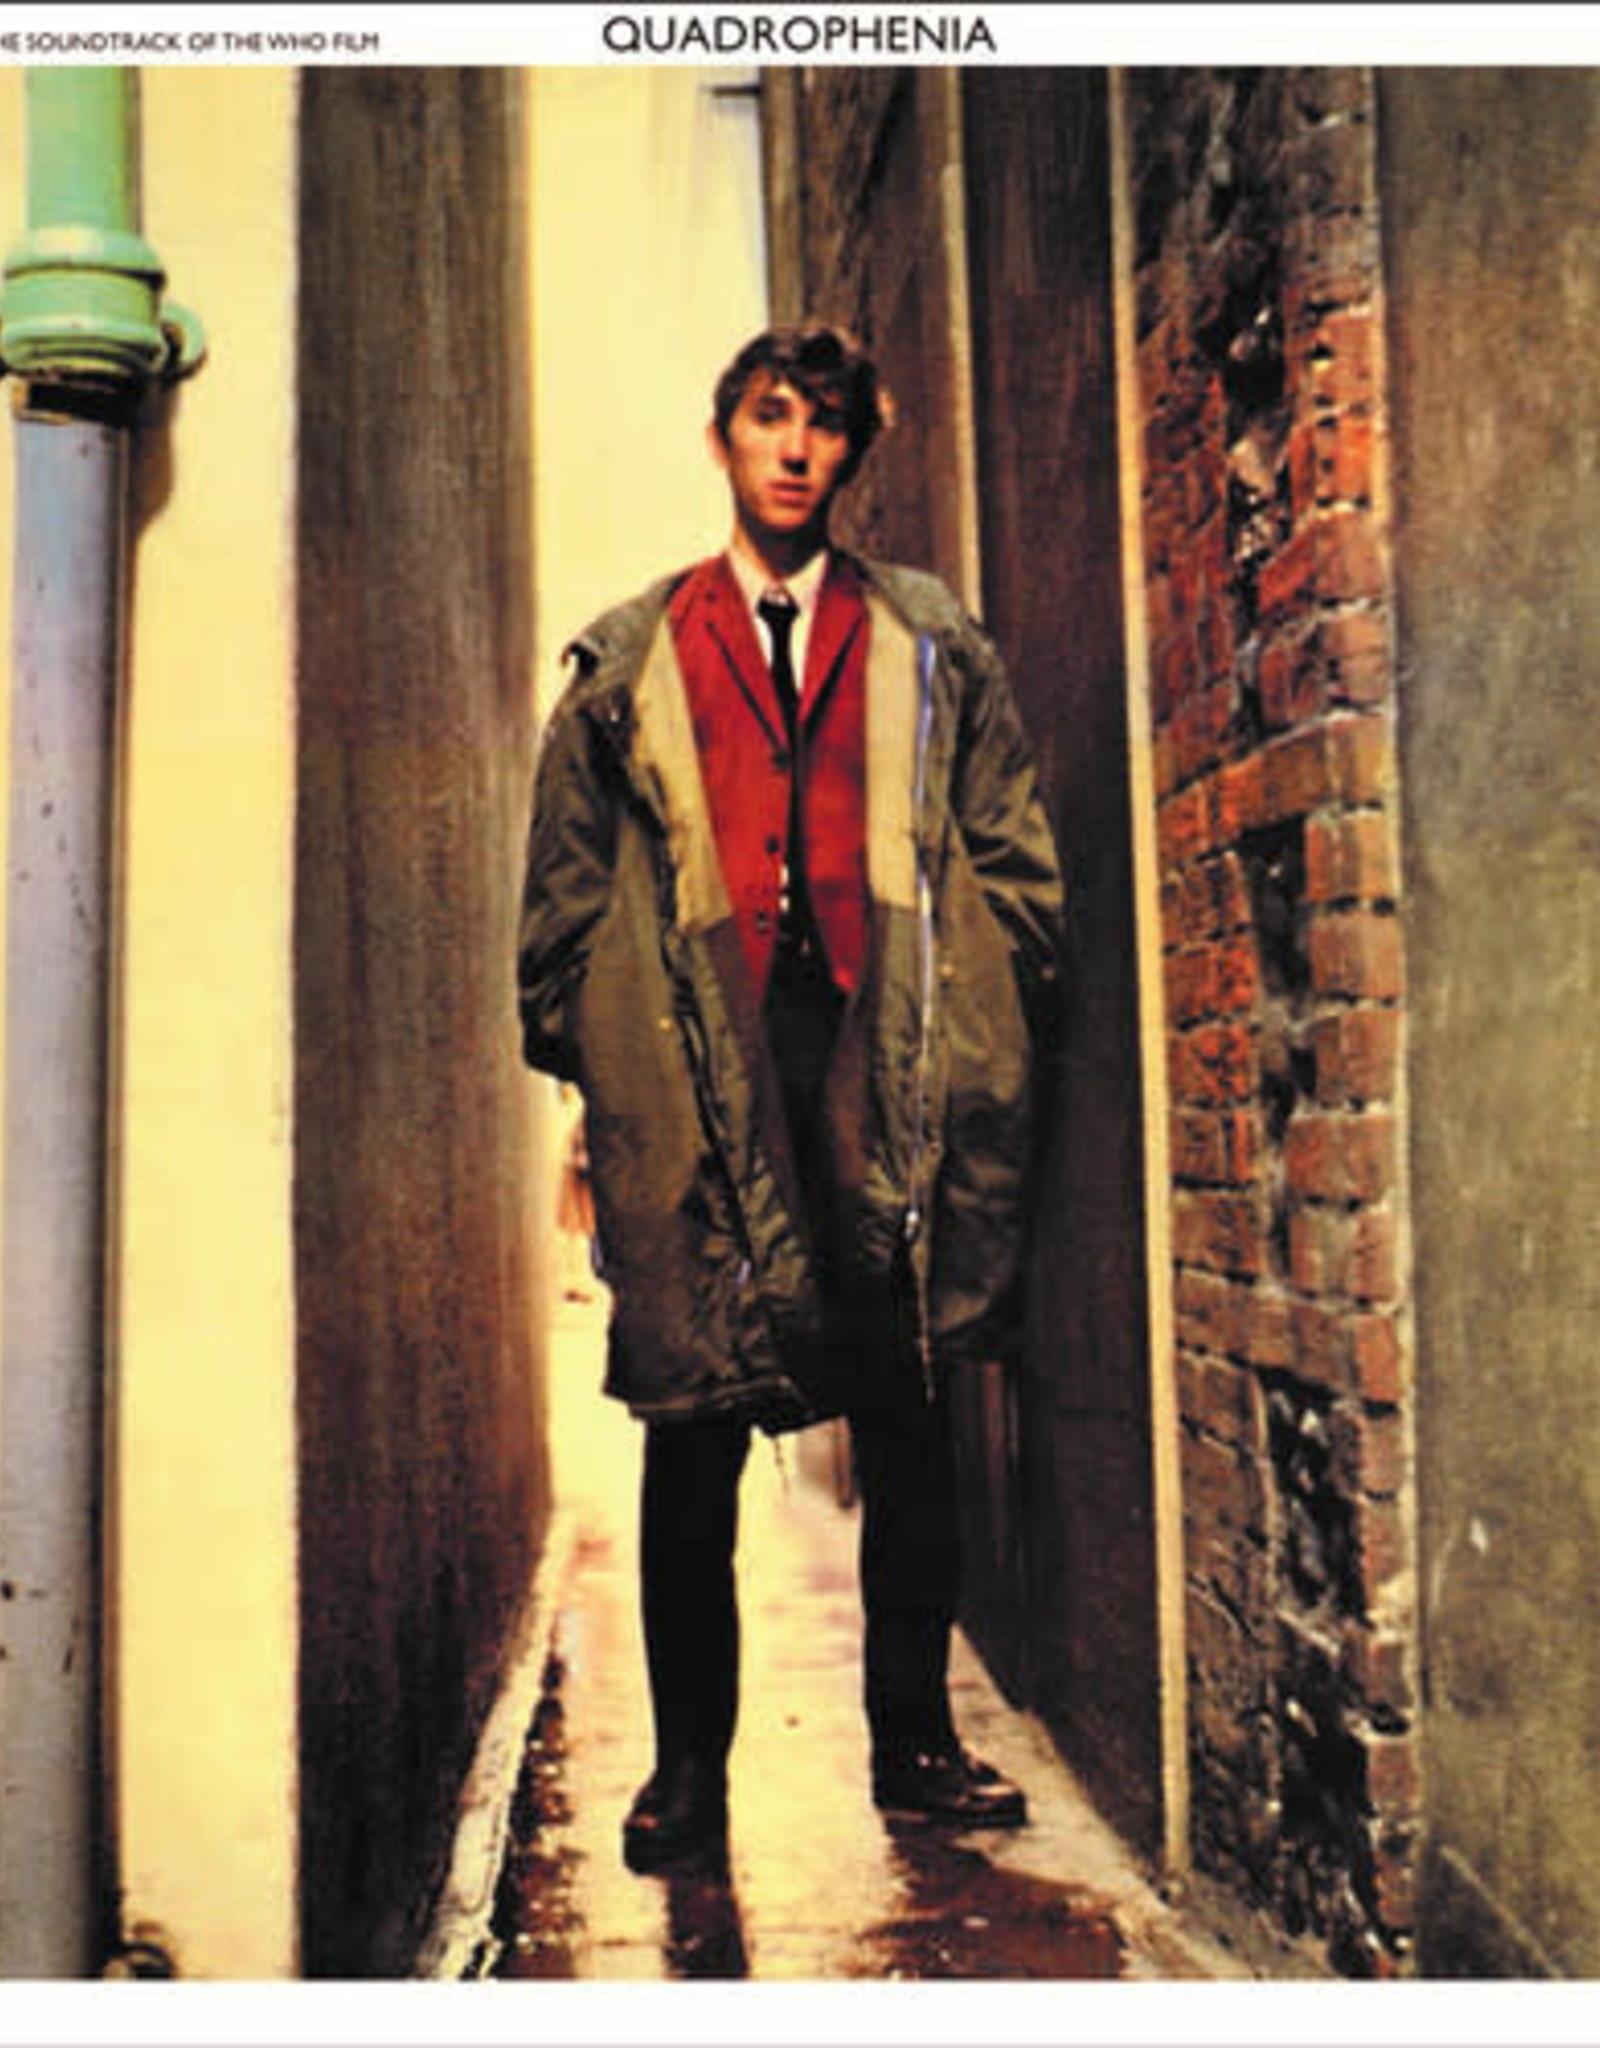 The Who - Quadrophenia (Soundtrack)